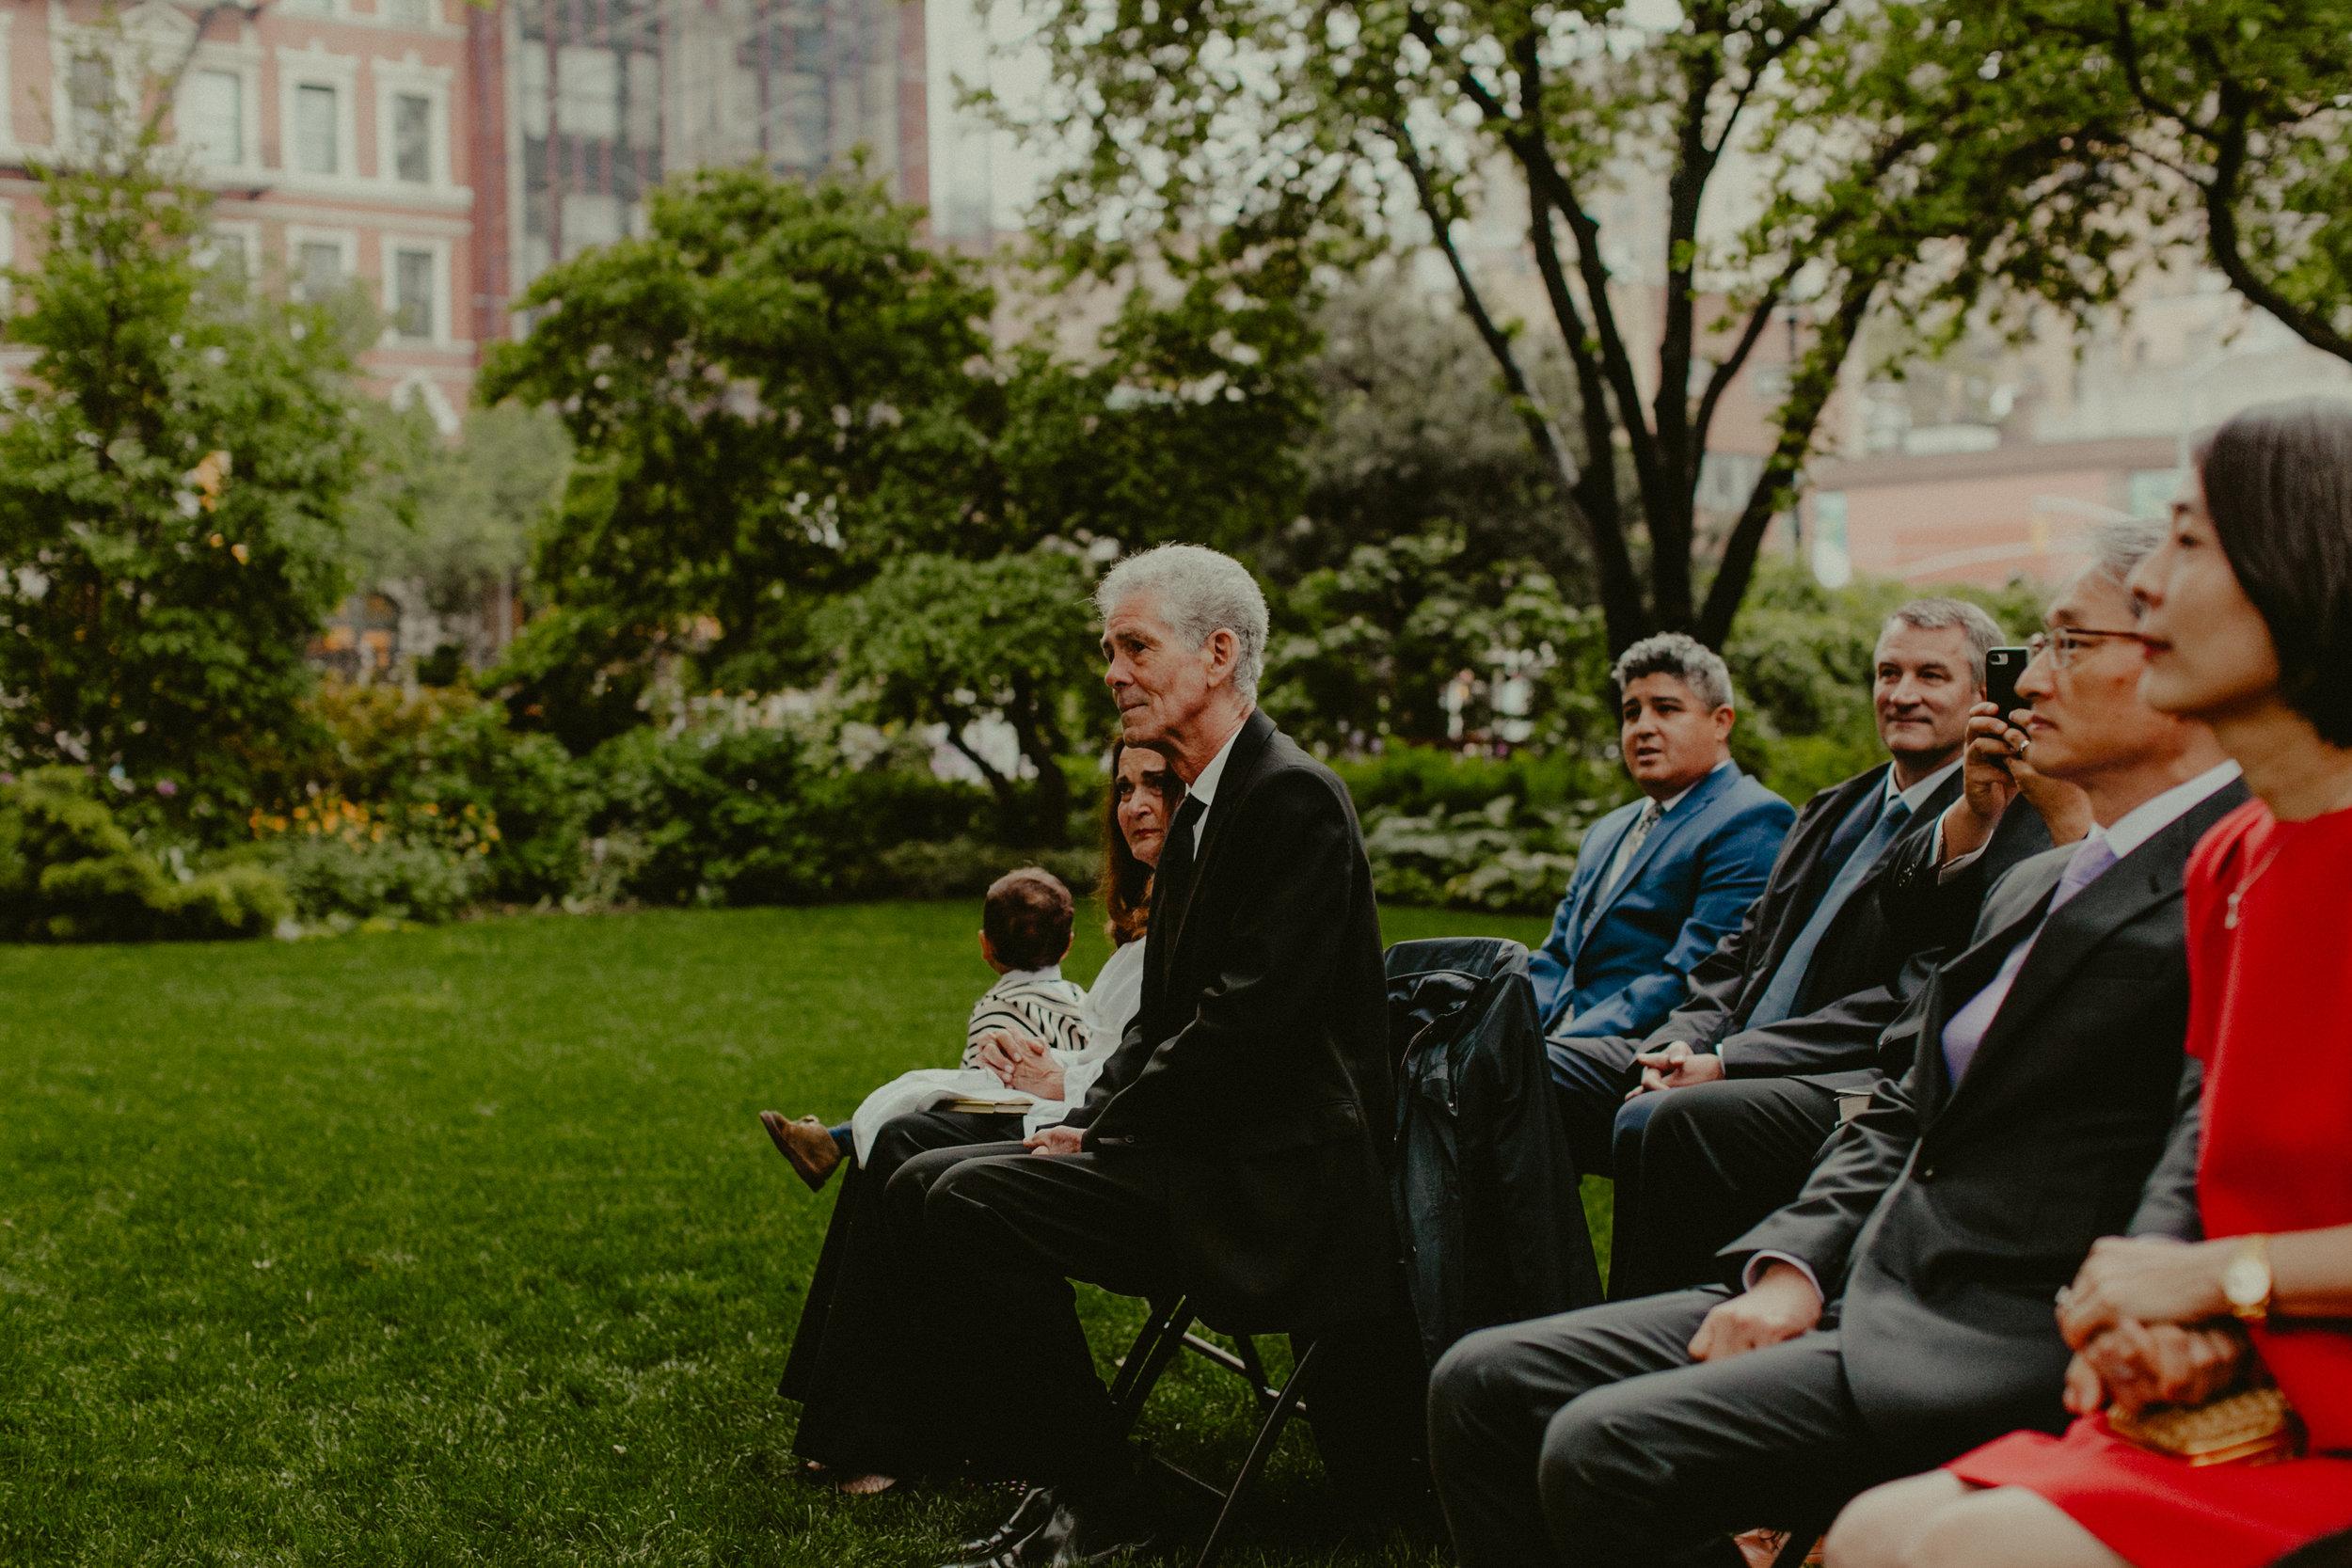 beekman hotel 455jefferson garden market wedding.JPG